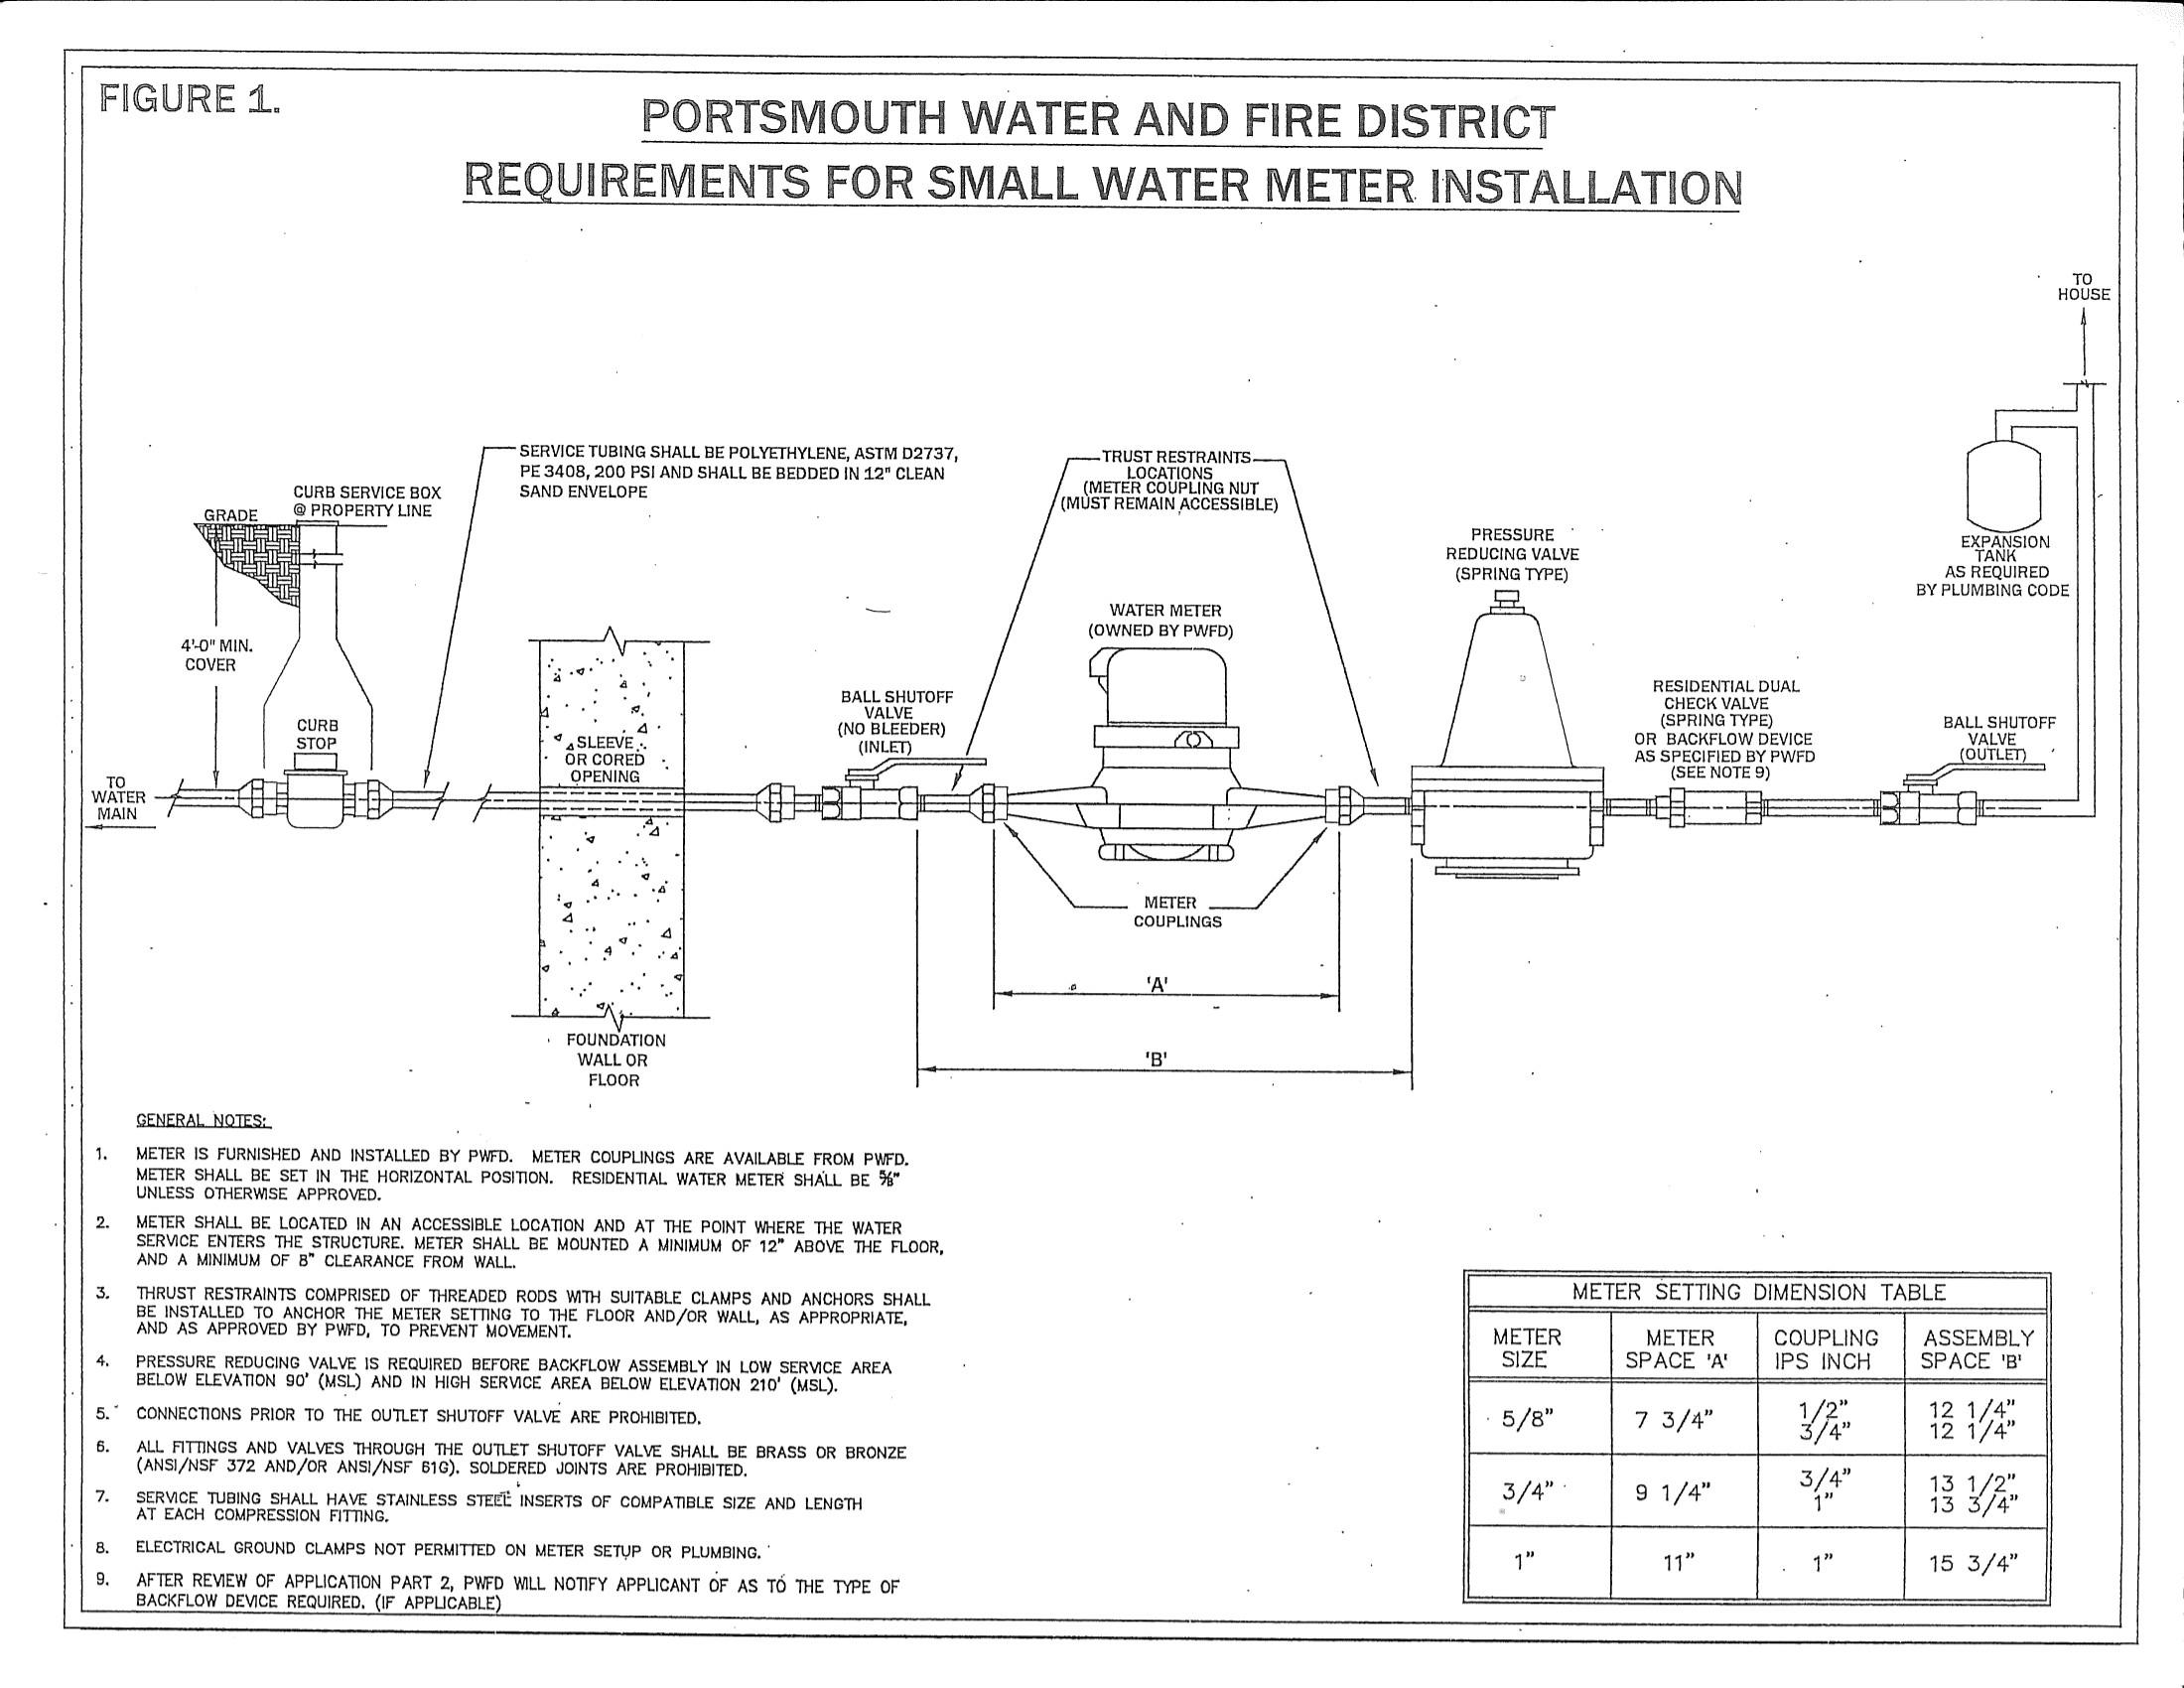 small water meter installation portsmouth water and fire district bypass water meter installation diagram water meter [ 2200 x 1700 Pixel ]